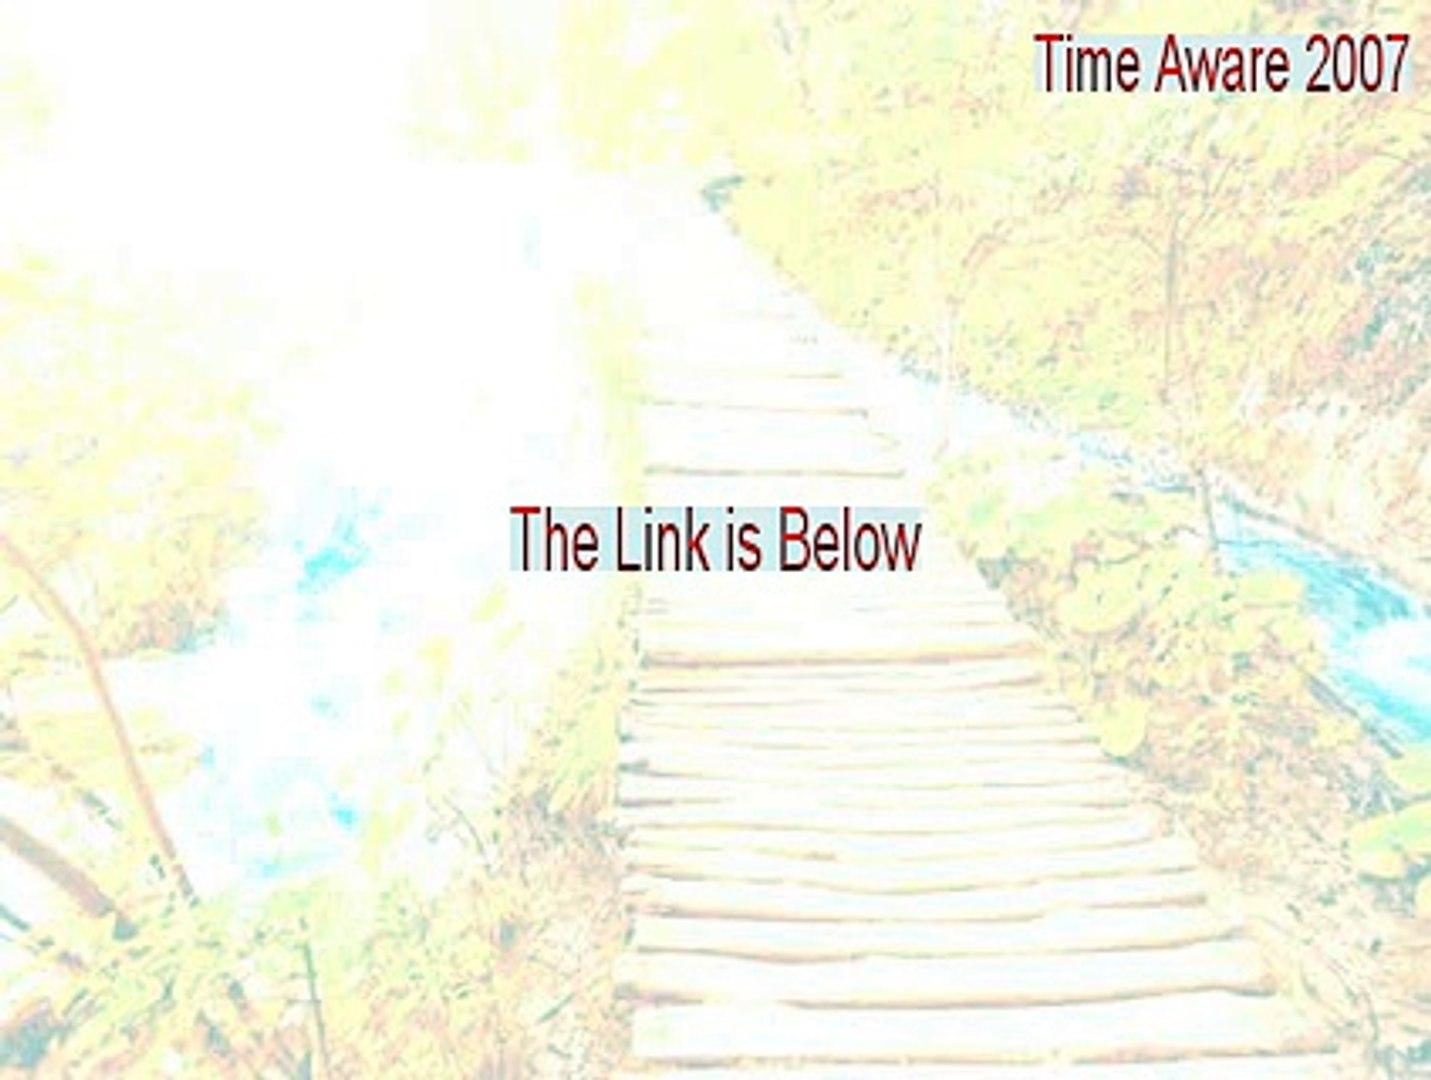 Time Aware 2007 Serial (Time Aware 2007 2015)